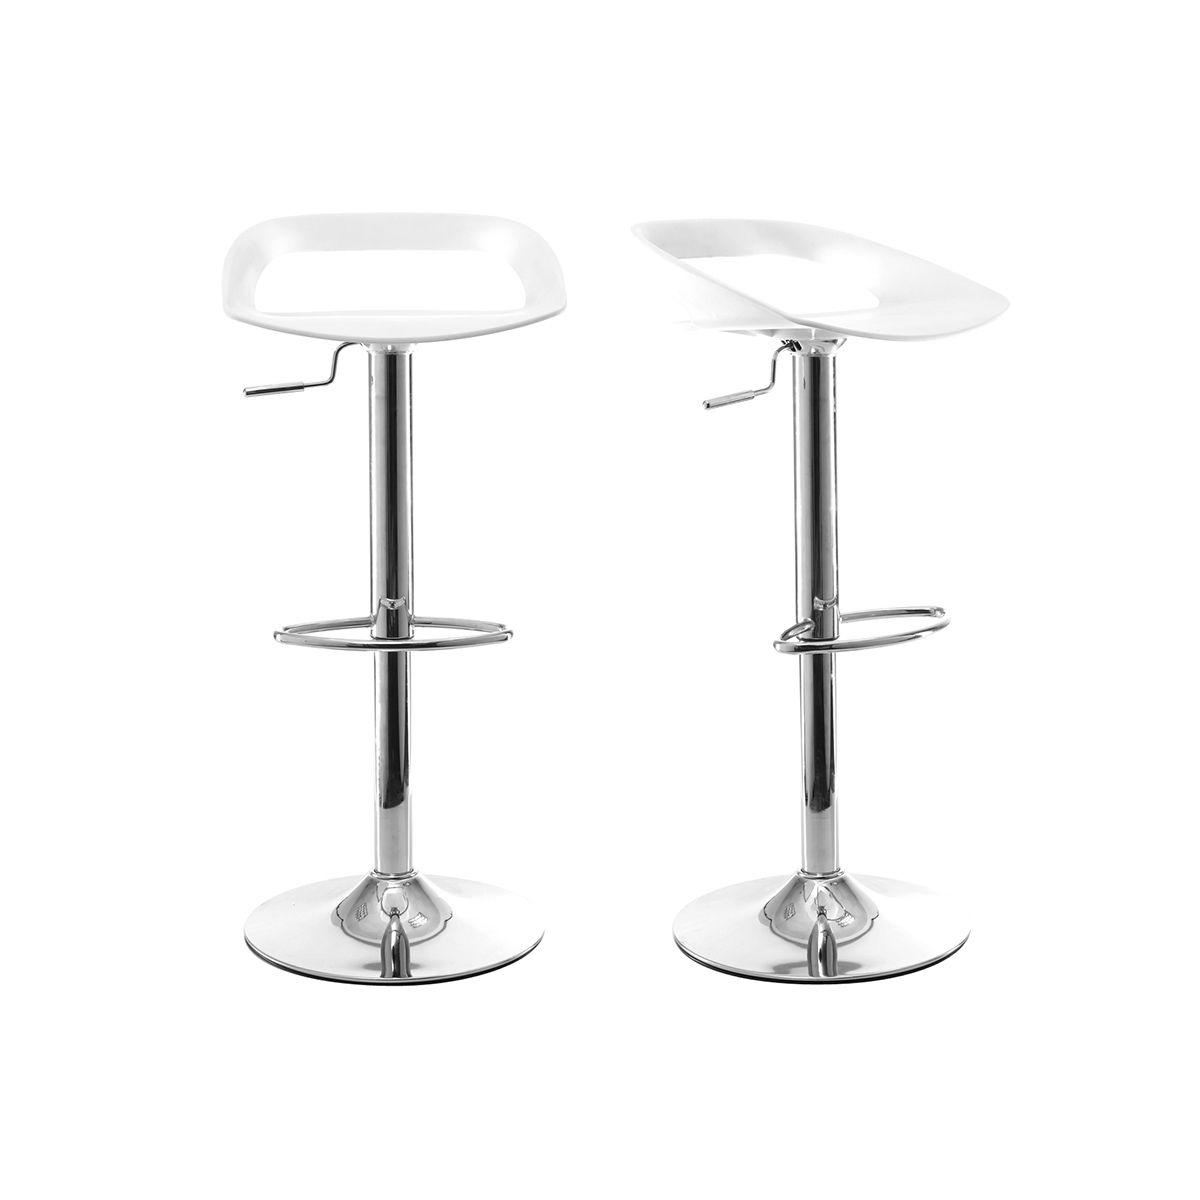 Gruppo di 2 sgabelli da bar design bianchi PHENIX Sgabelli da bar